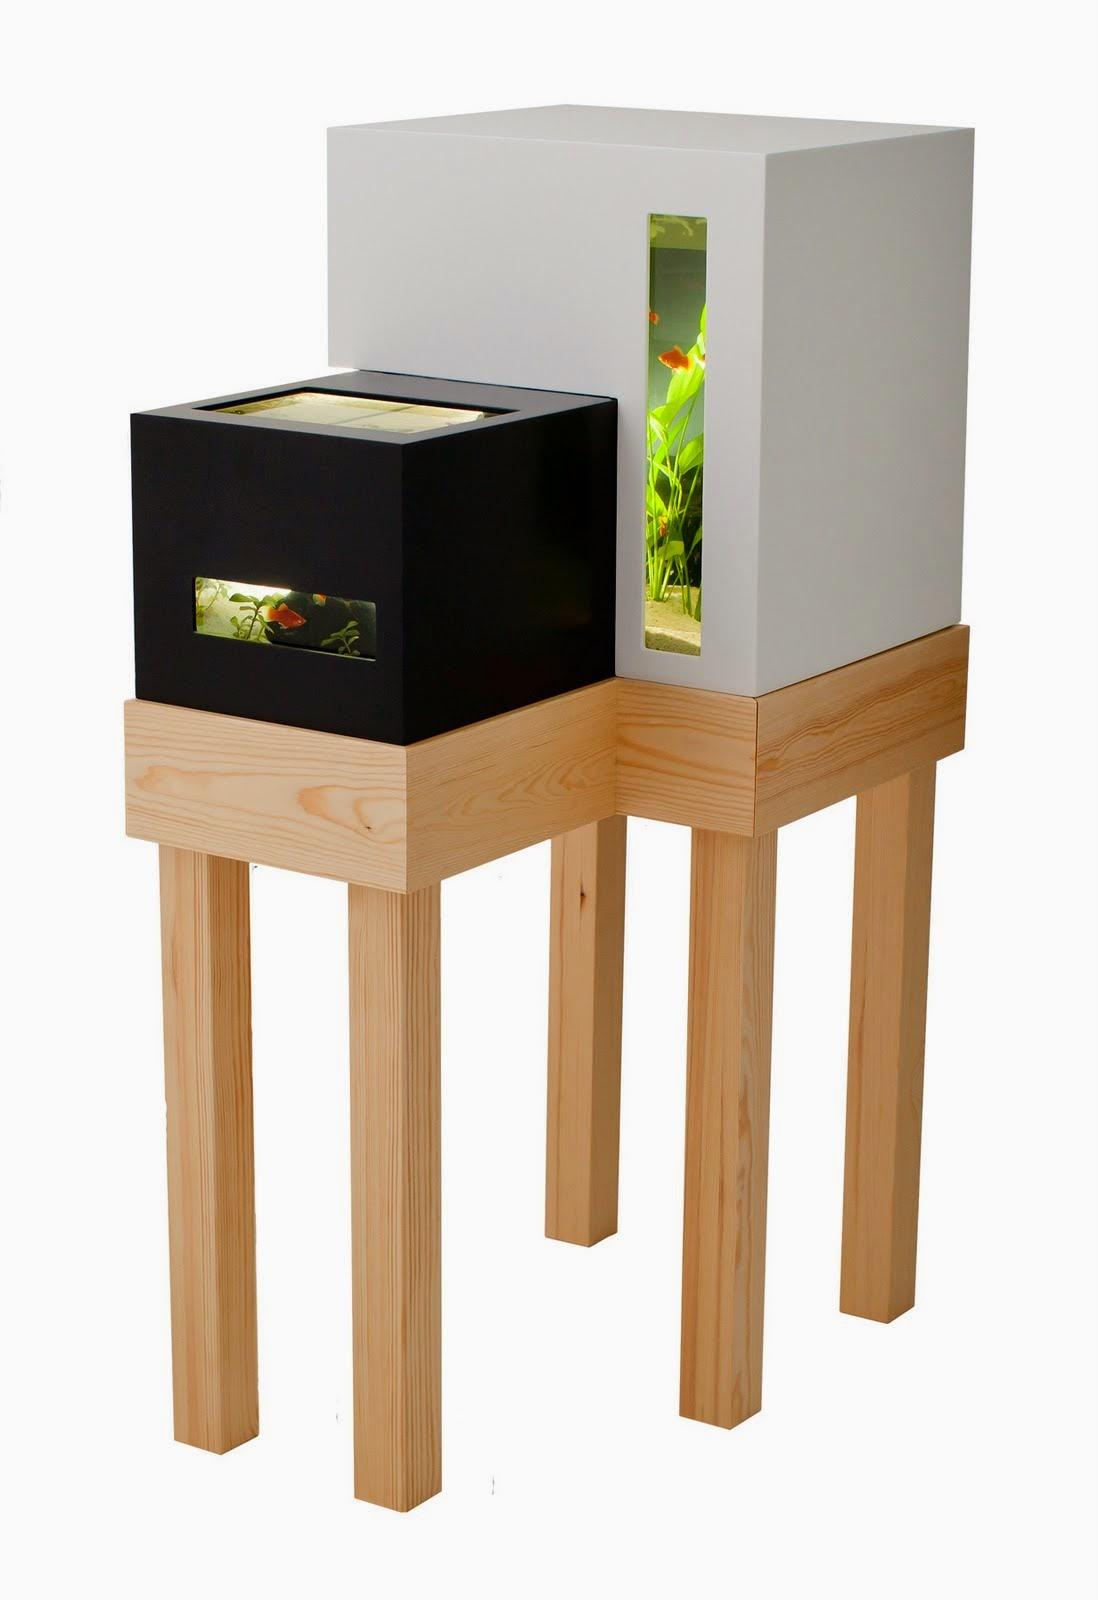 The cool modern fish tanks idea image for Modern fish tanks